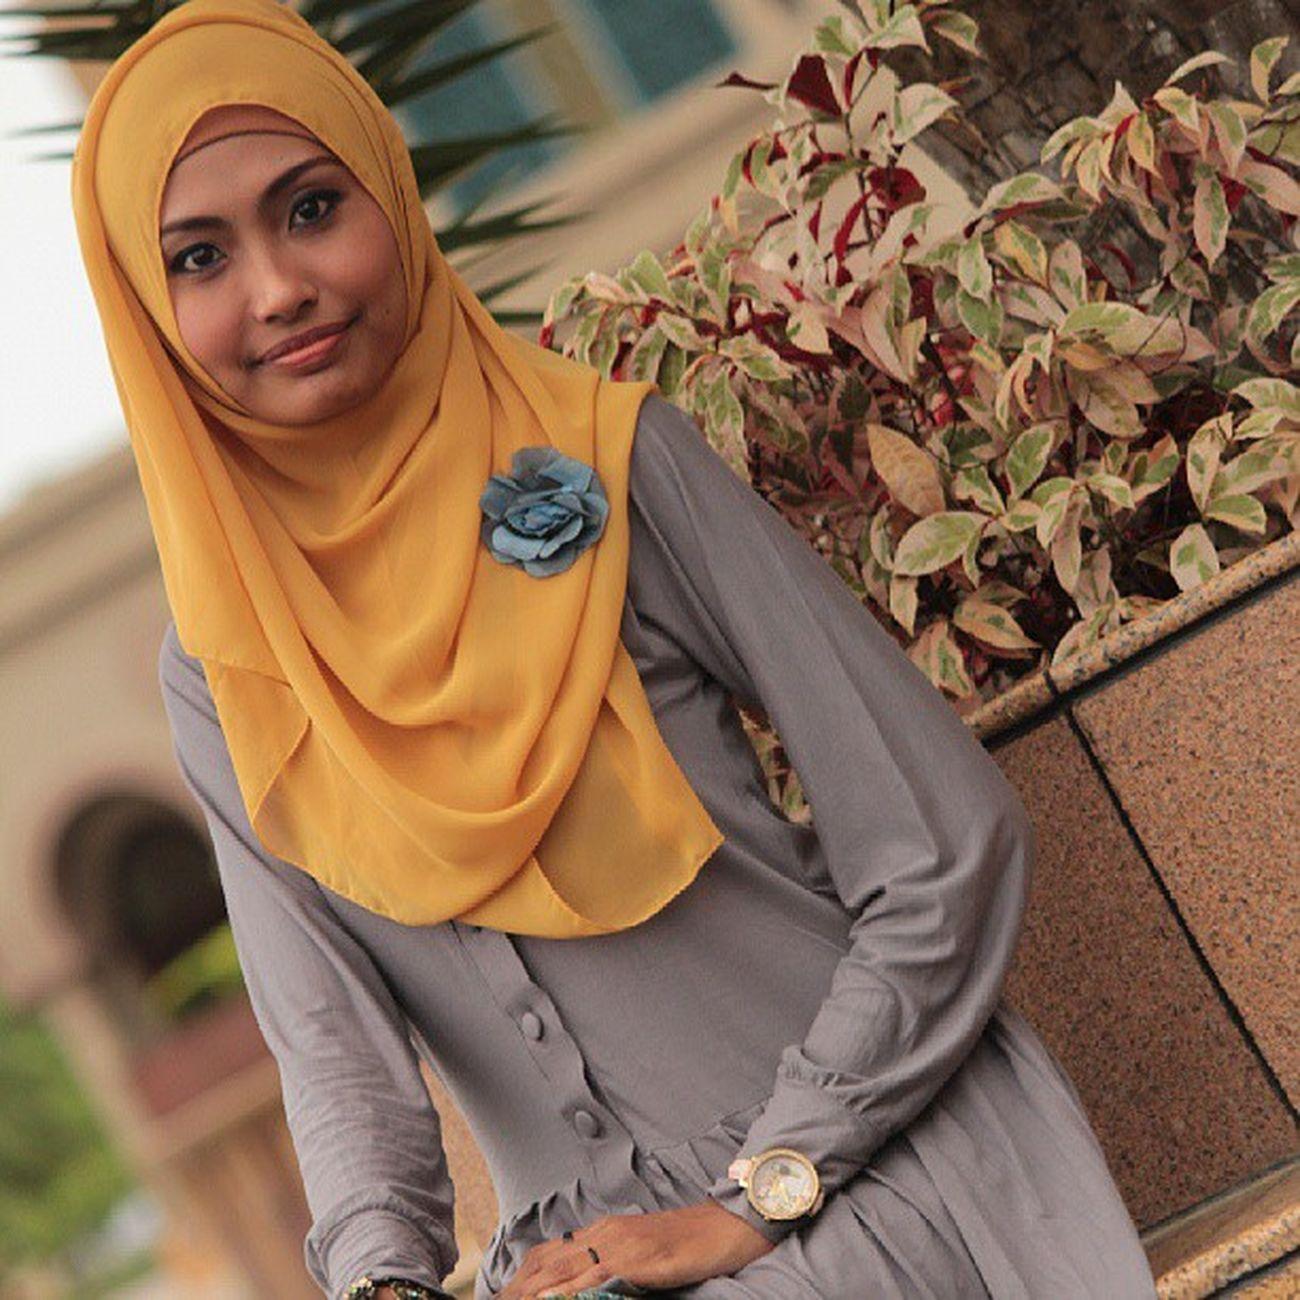 Hijab Jilbab Instamarinda Instagram samarinda muslim ramadhan